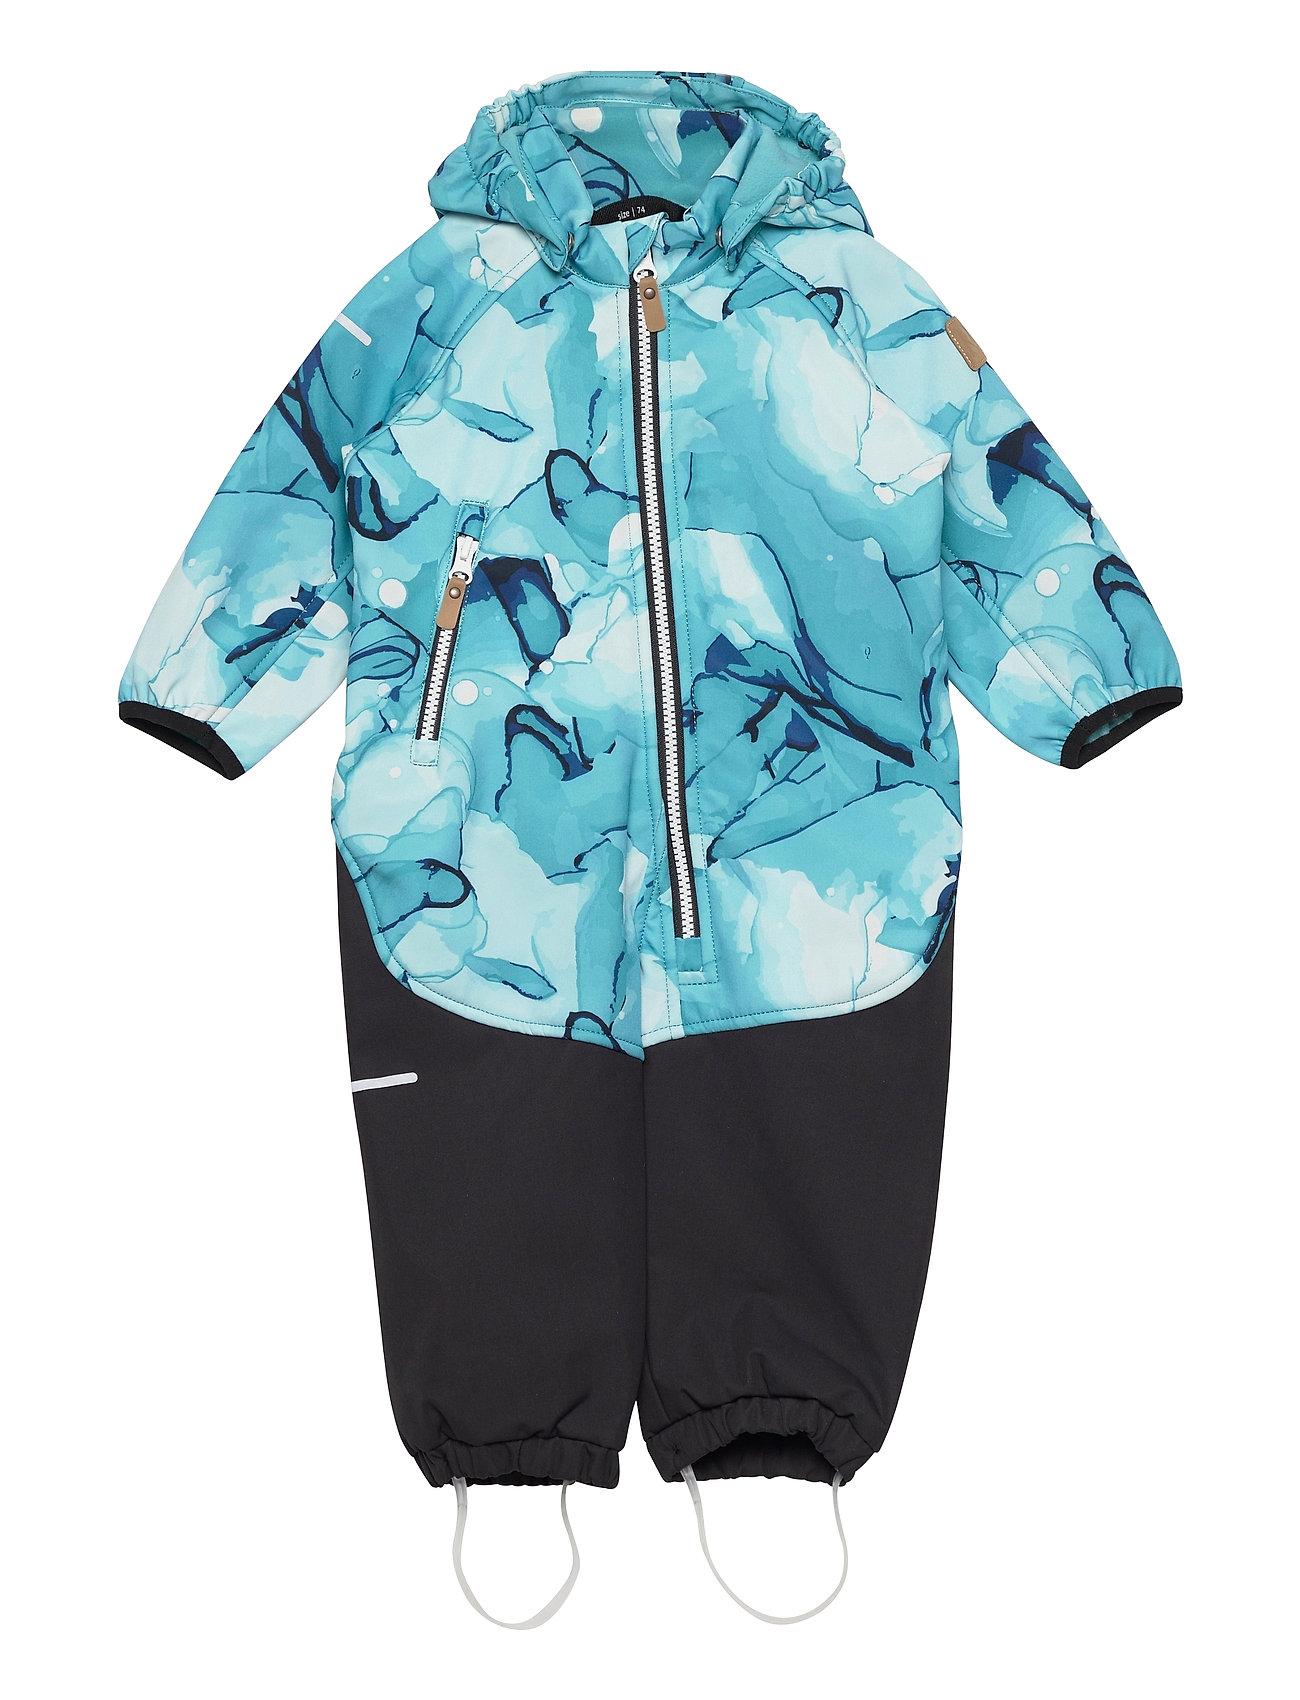 Mjosa Outerwear Softshells Softshell Sets & Suits Reima